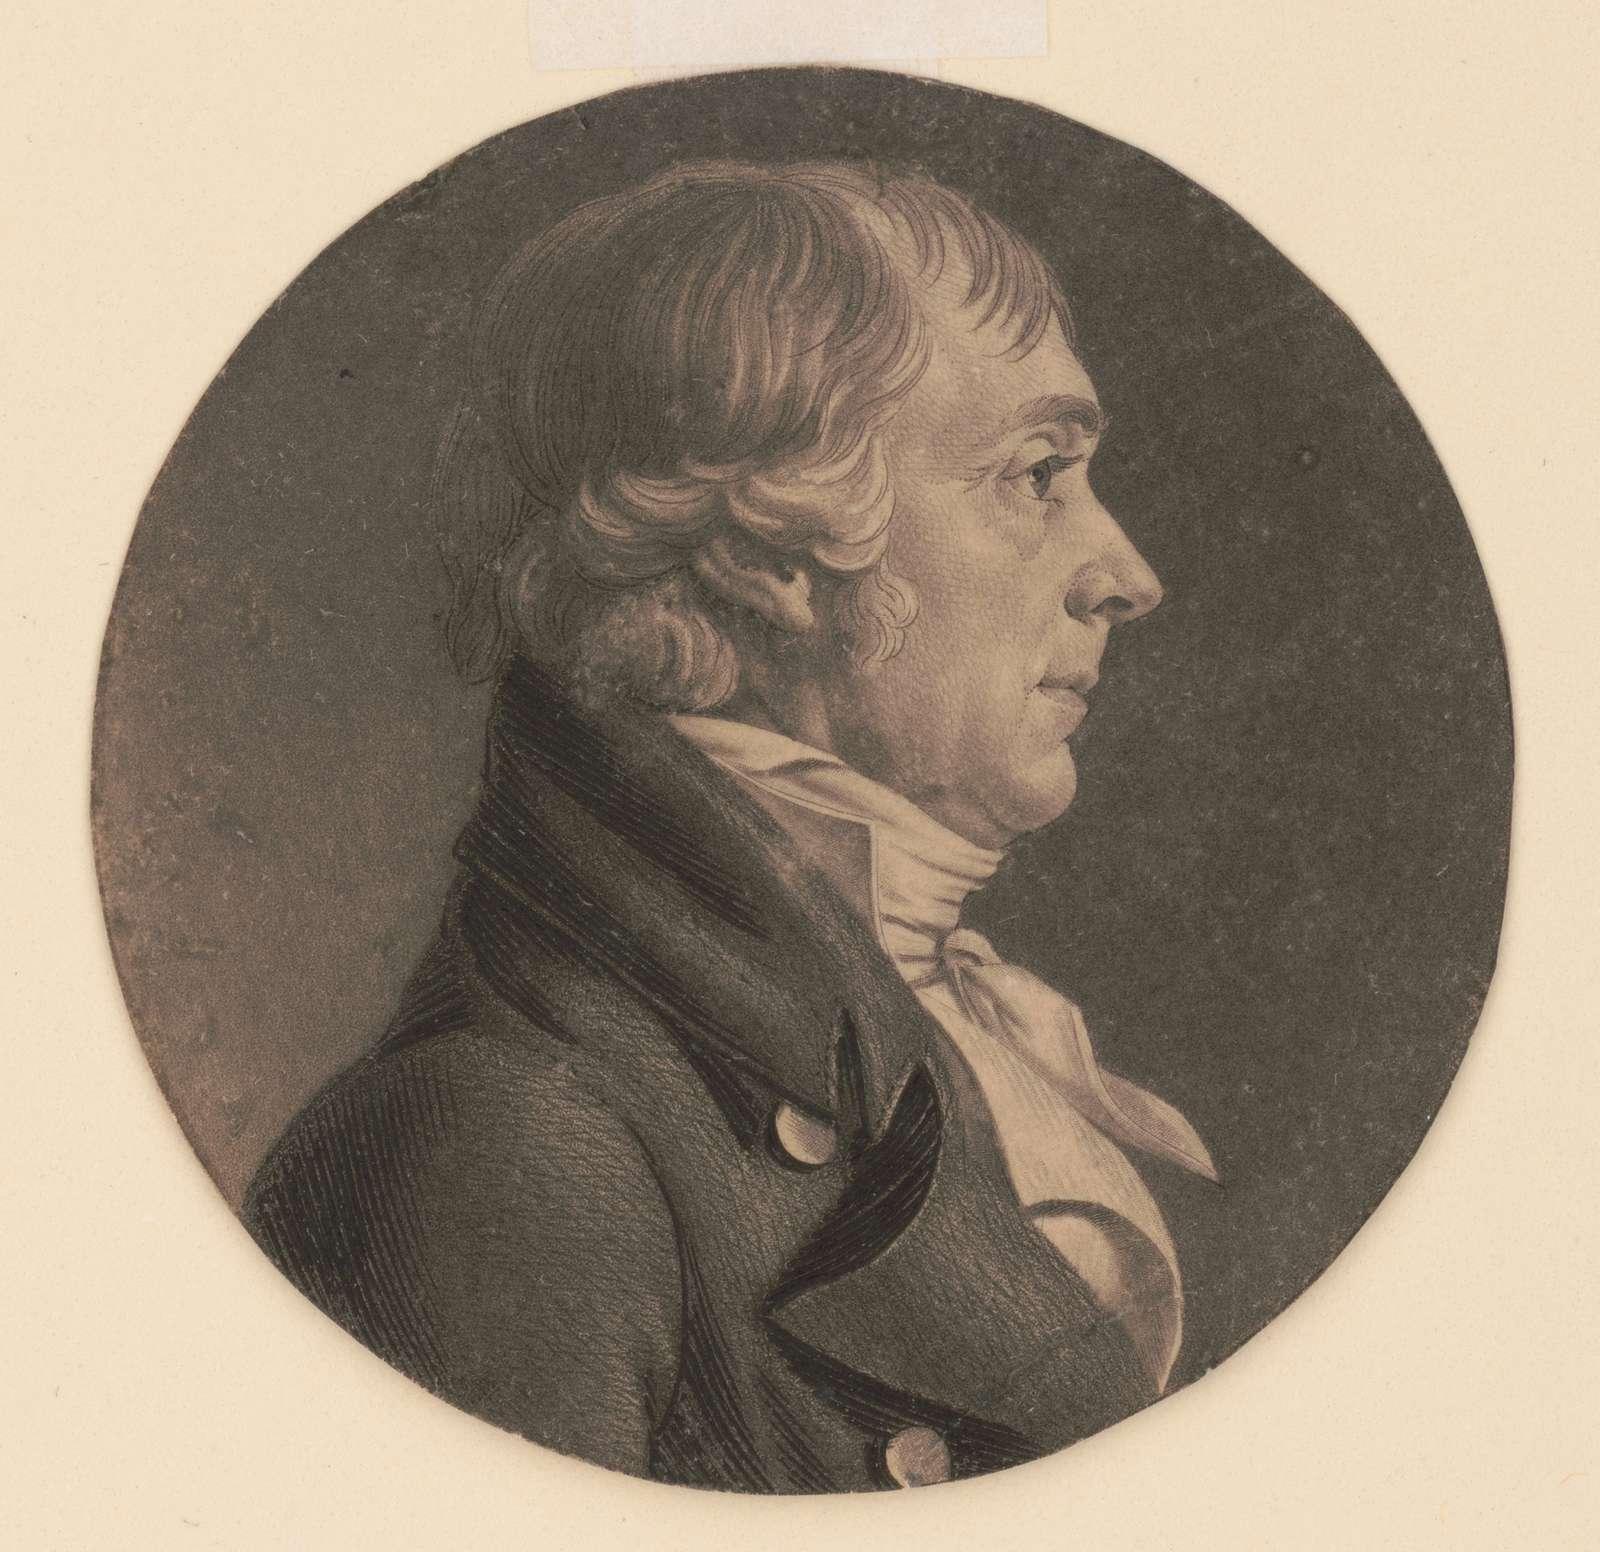 John S. Smith, head-and-shoulders portrait, right profile